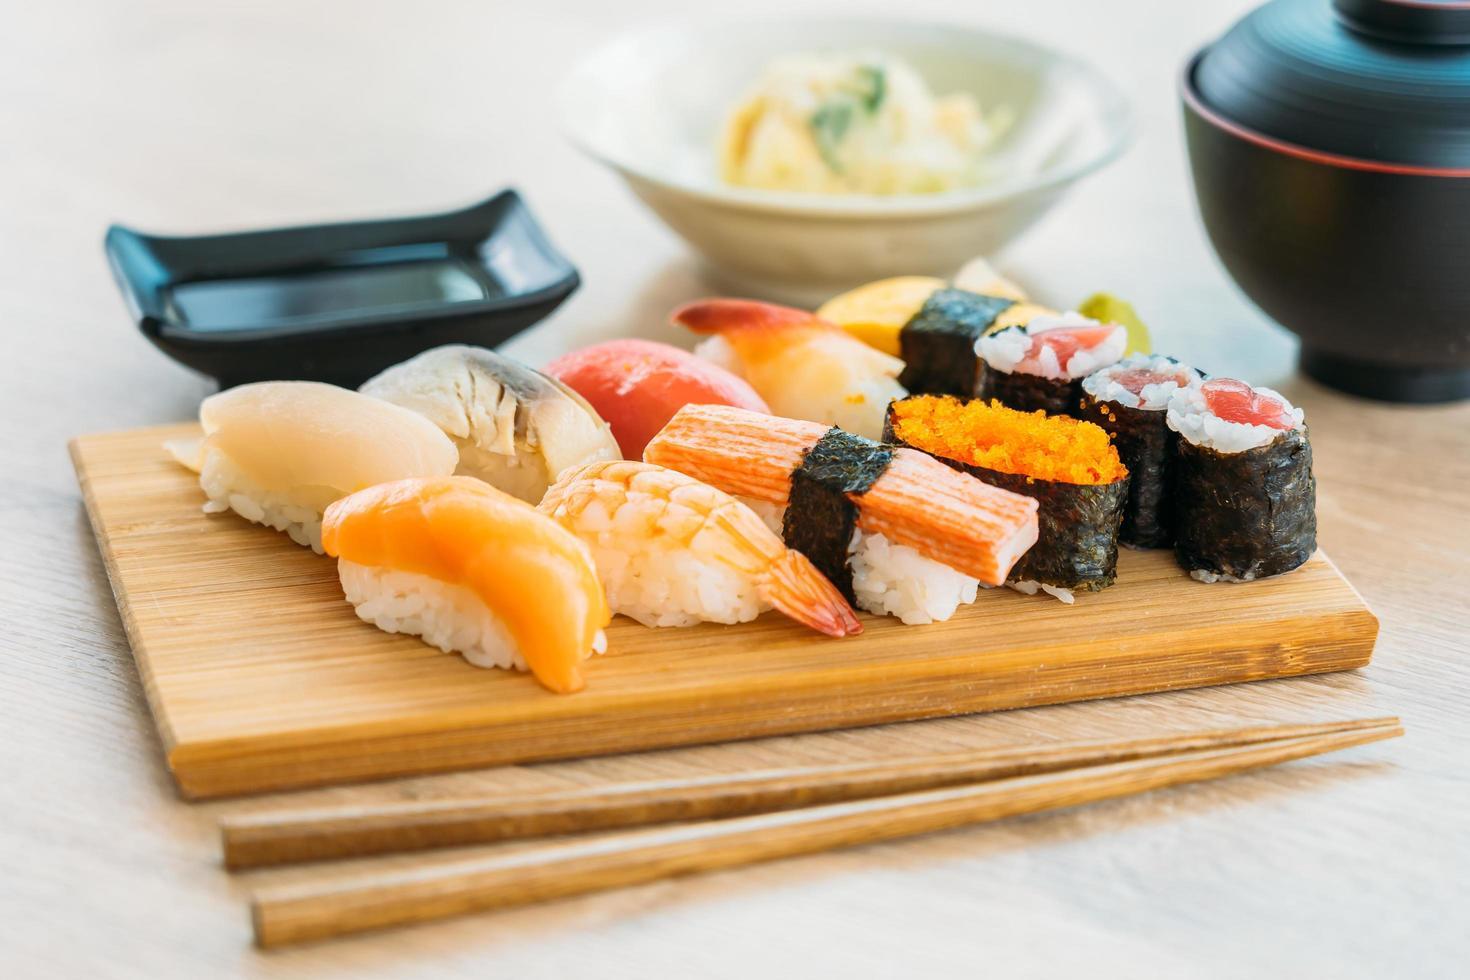 zalm, tonijn, schelp, garnalen en ander vlees sushi maki foto